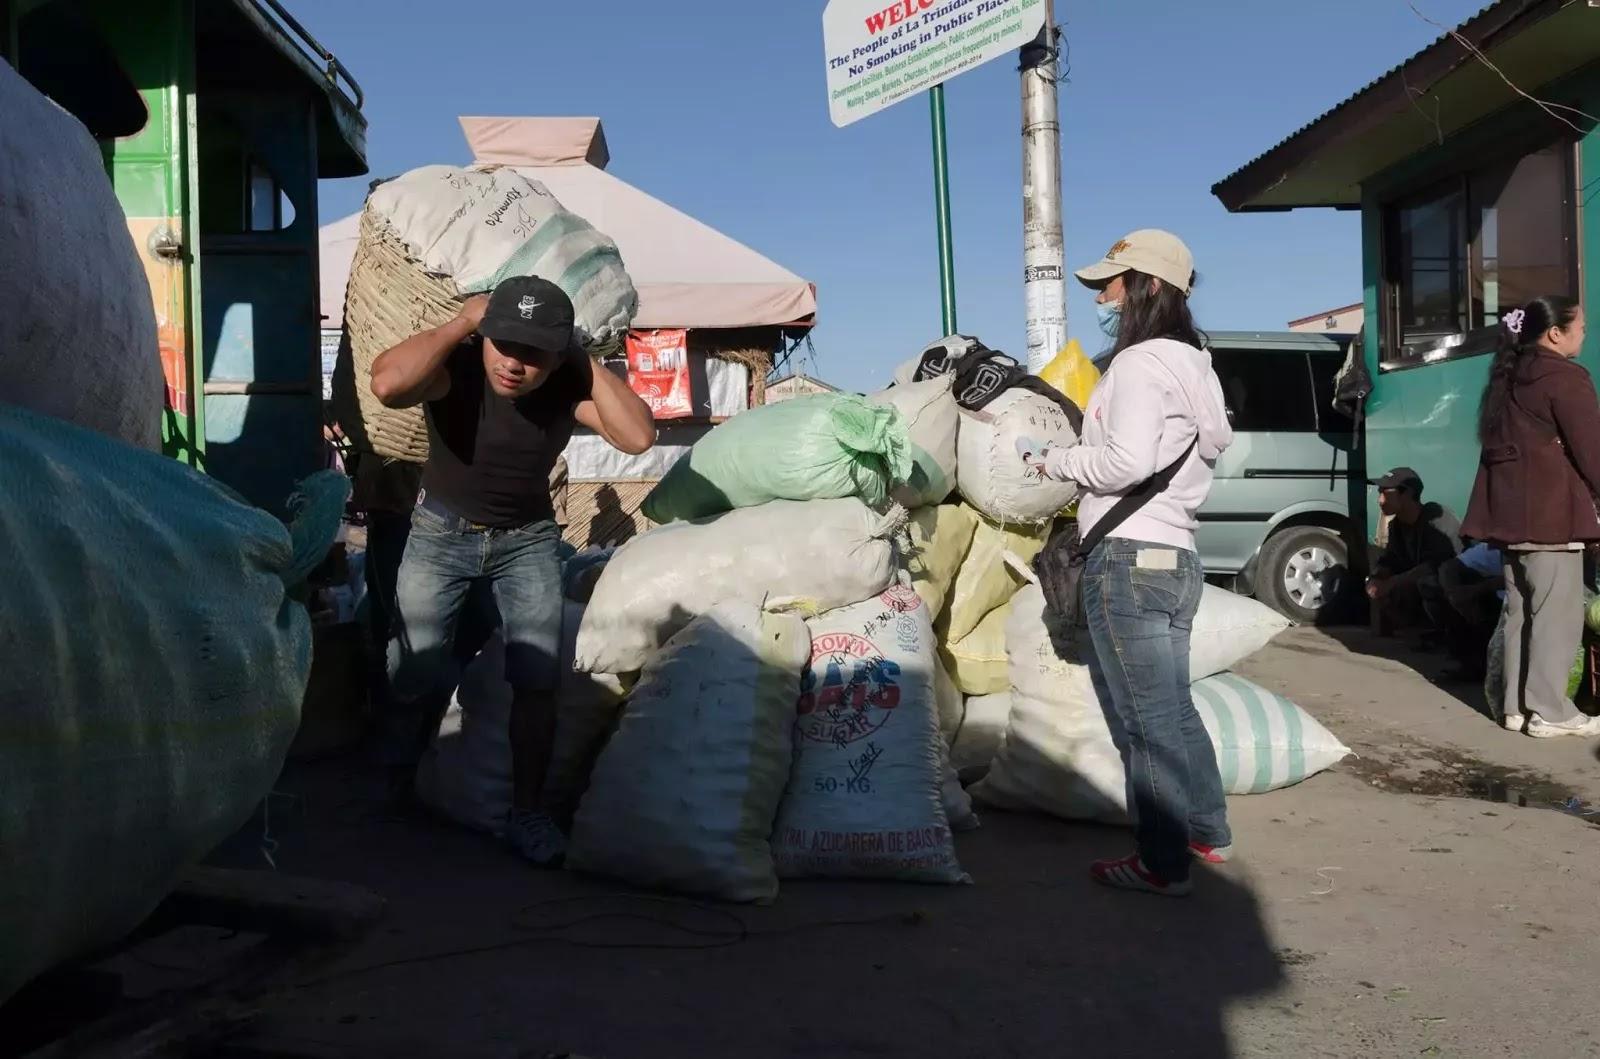 Hardworking Porter Trading Post La Trinidad Benguet Cordillera Administrative Region Philippines